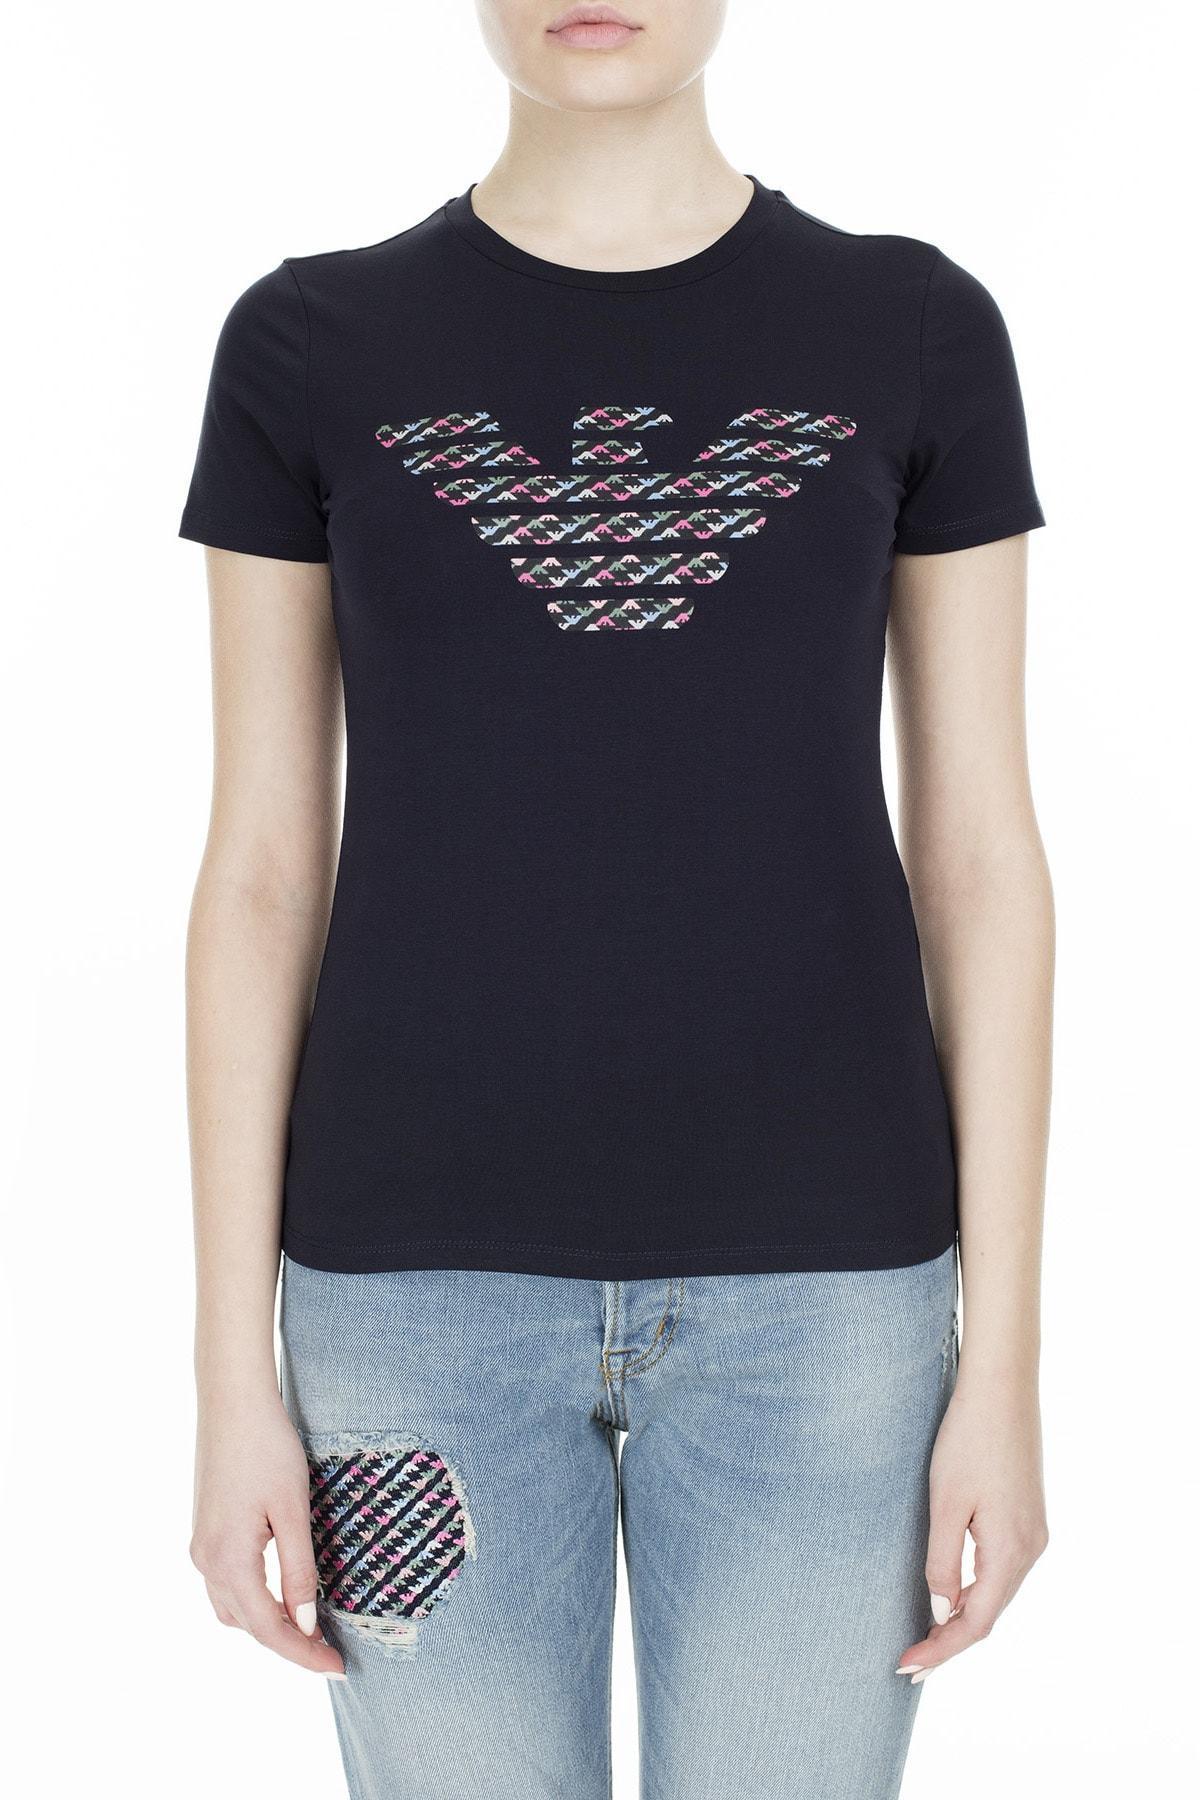 Emporio Armani T Shirt Kadın T Shirt S 6G2T7N 2J07Z 0927 S 6G2T7N 2J07Z 0927 0